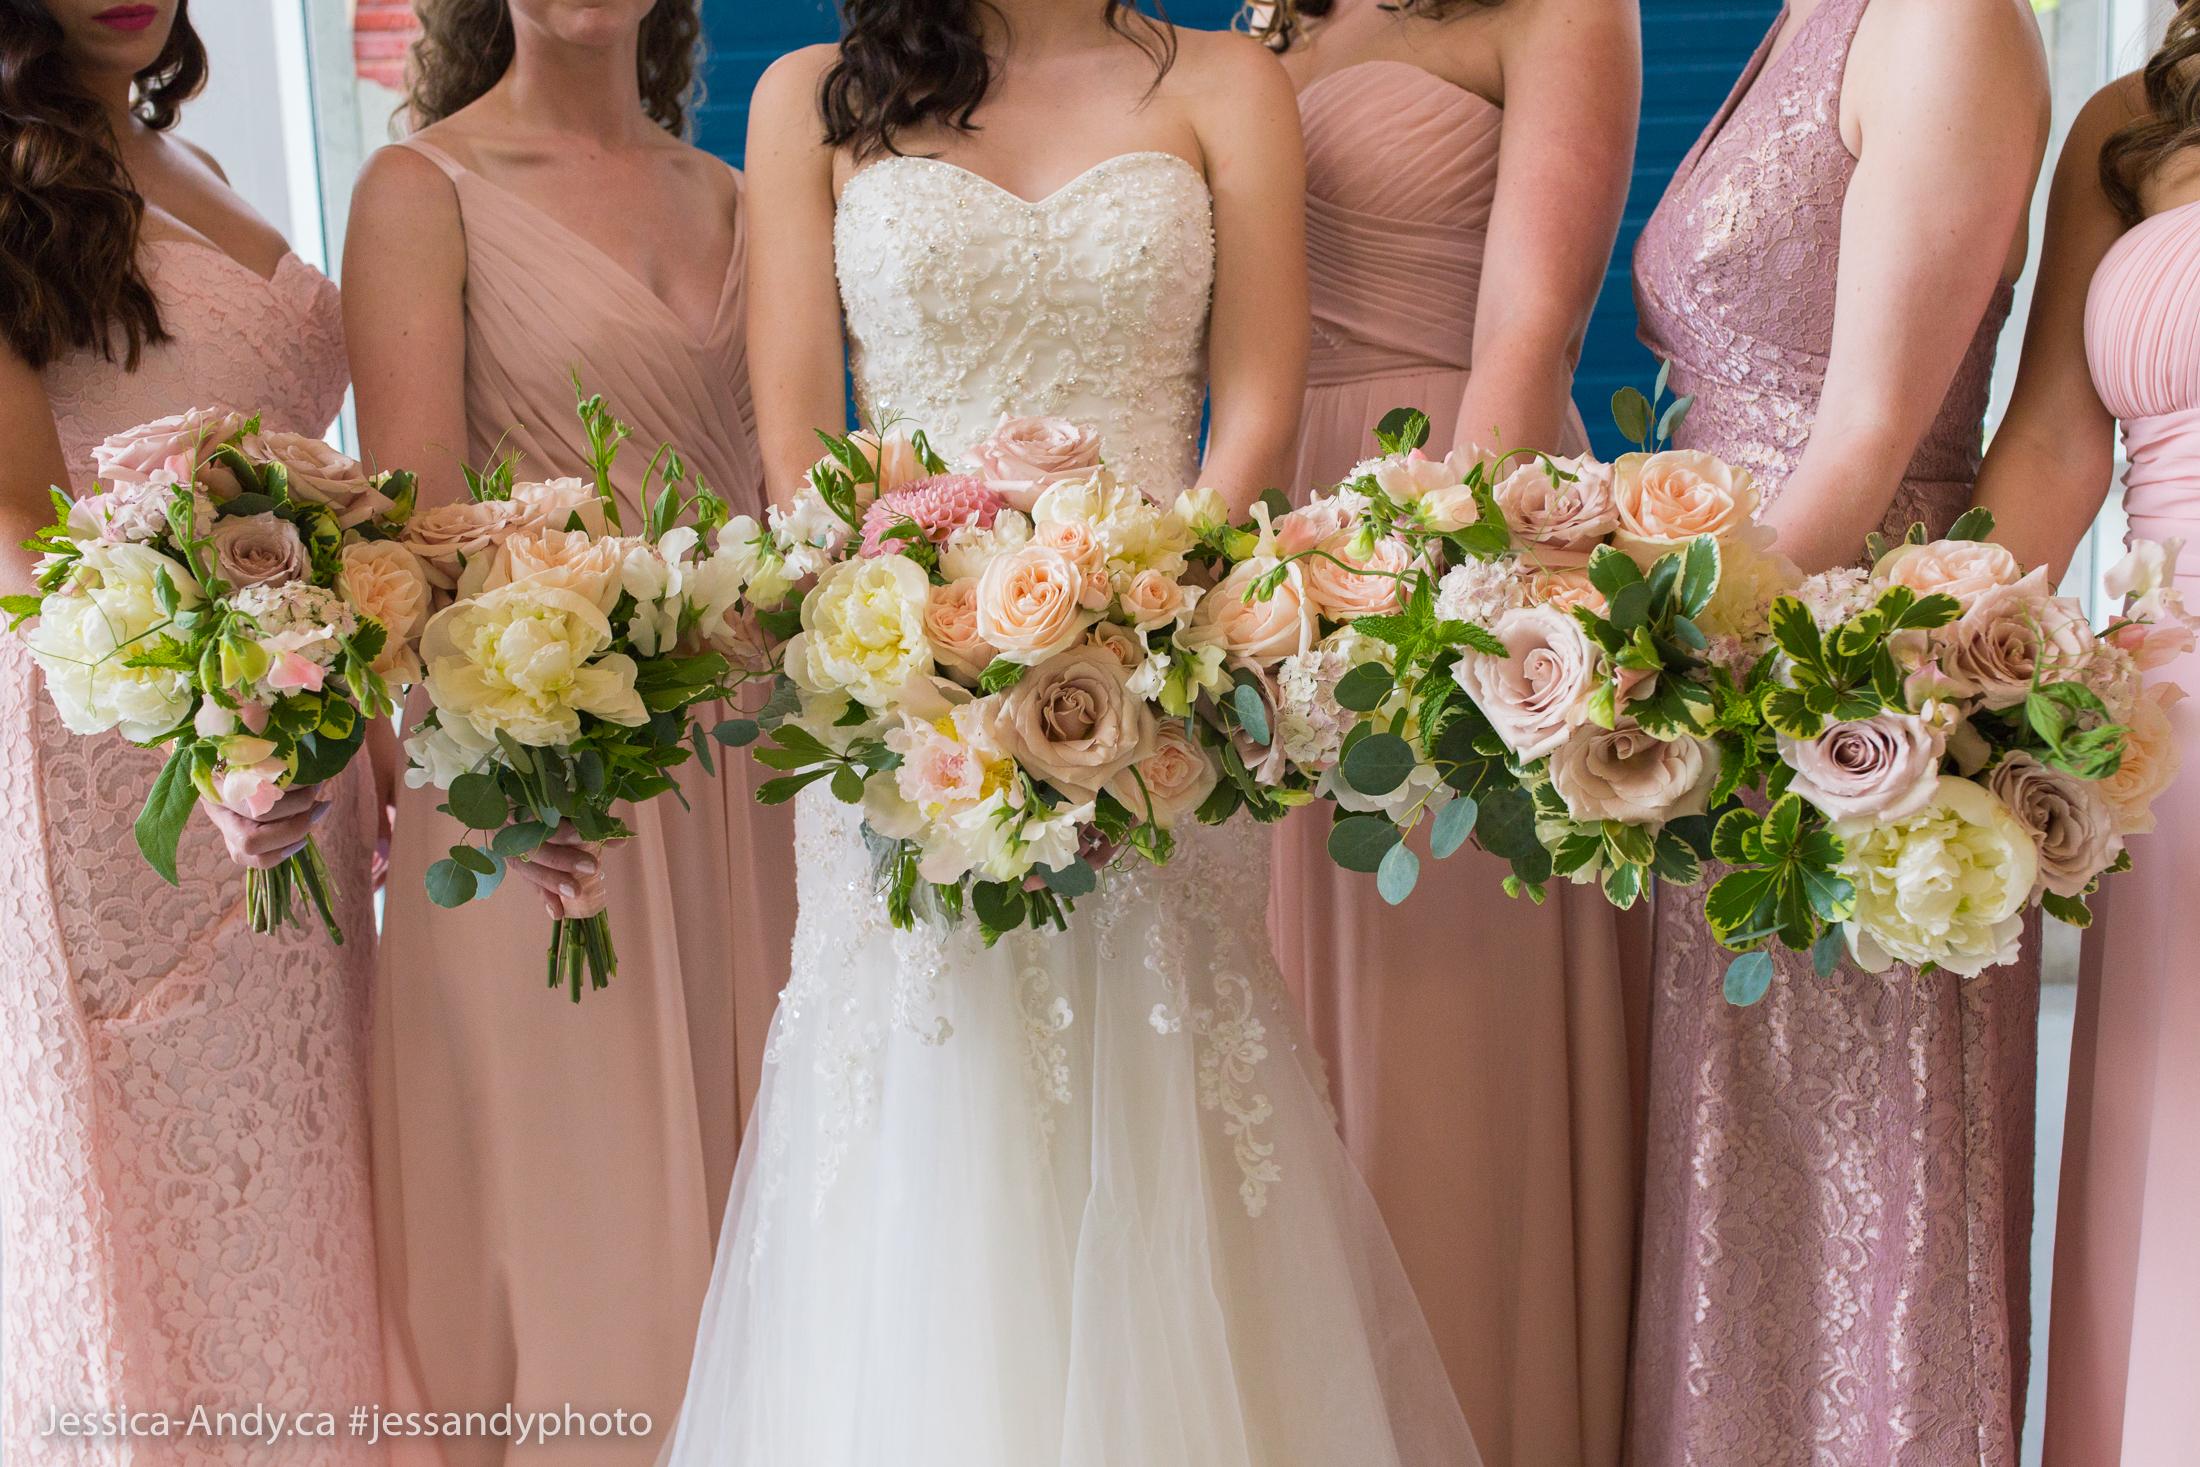 jessandyphoto_kinzydt_june112016_wedding_web-52.jpg